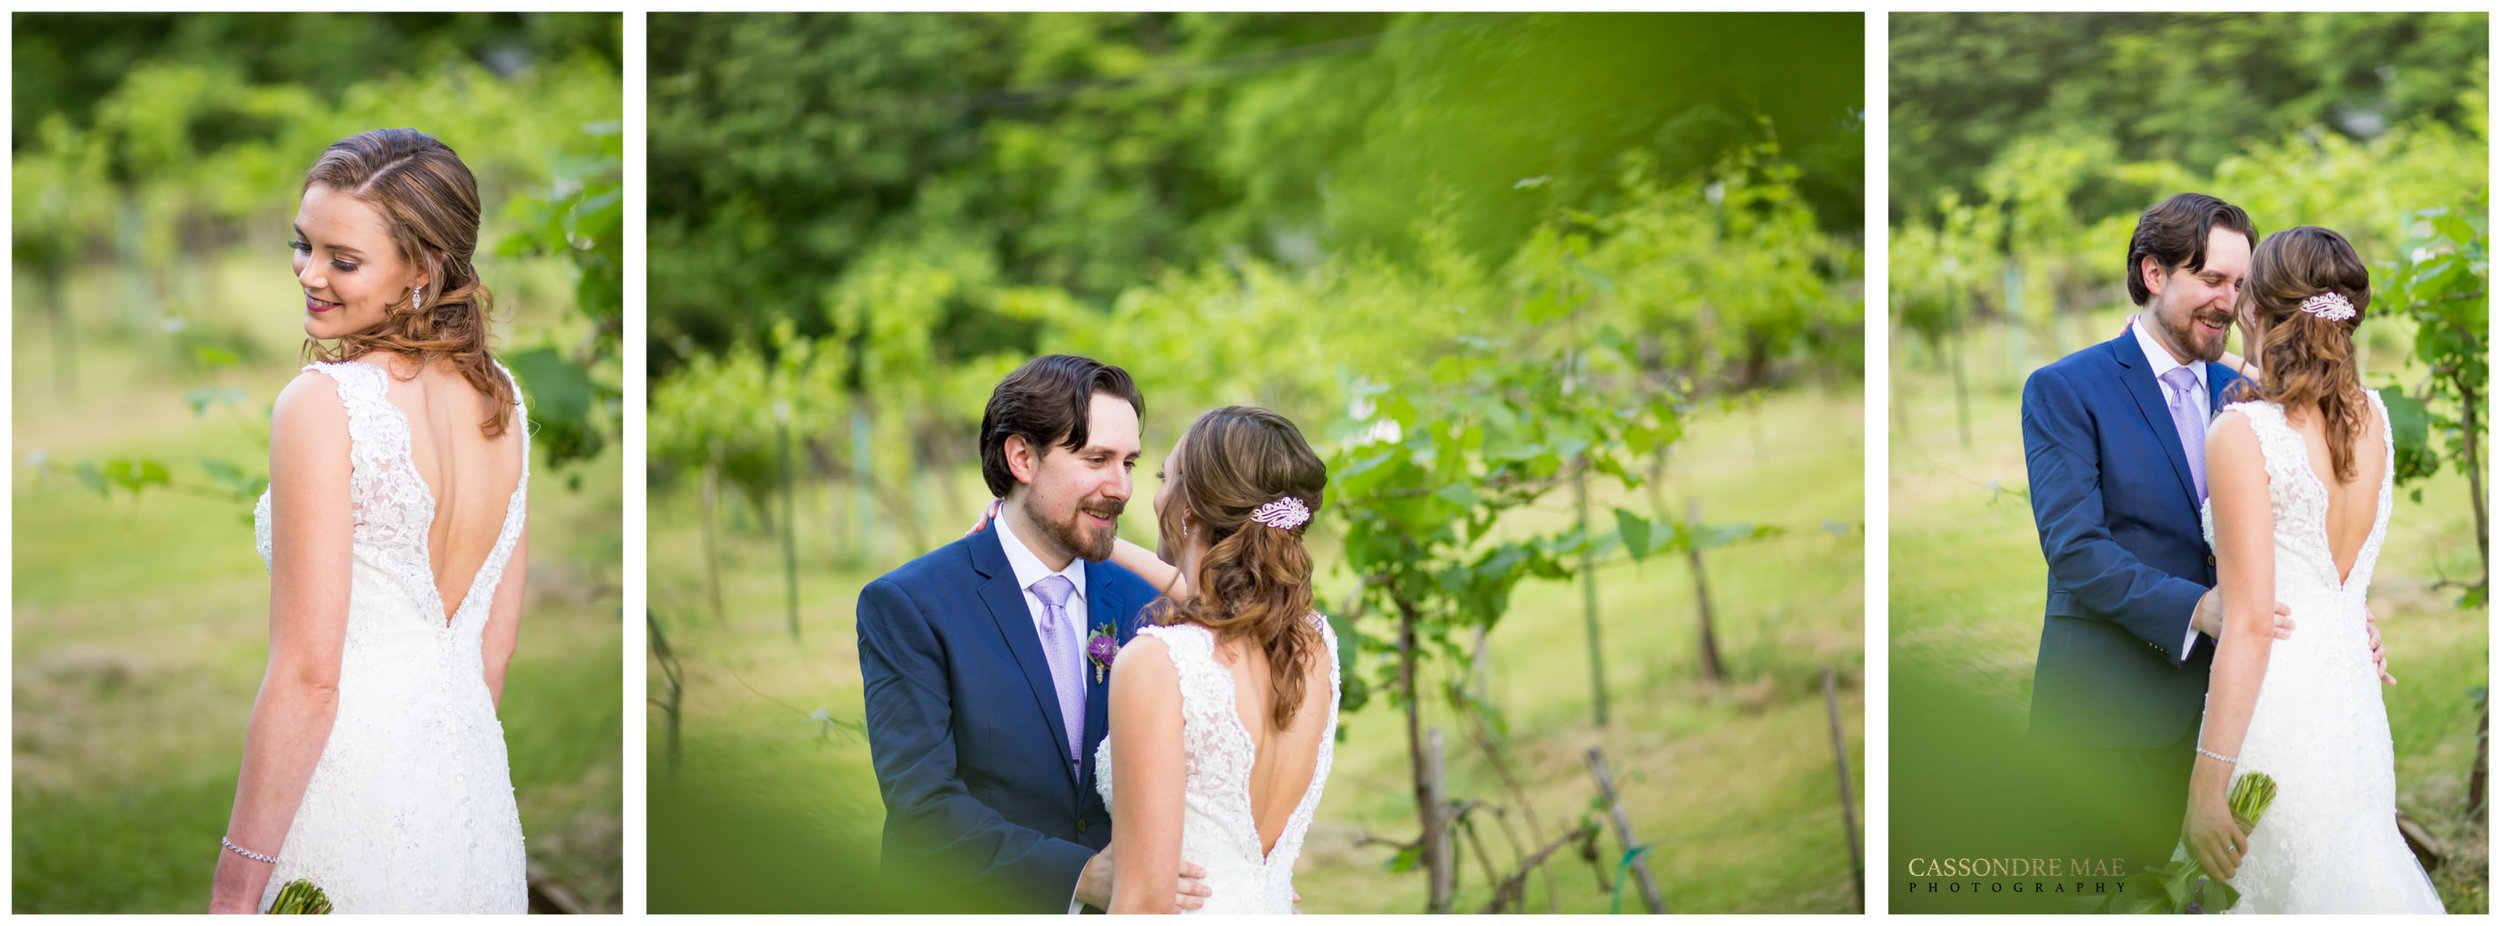 Cassondre Mae Photography hudson valley barn weddings -2.jpg